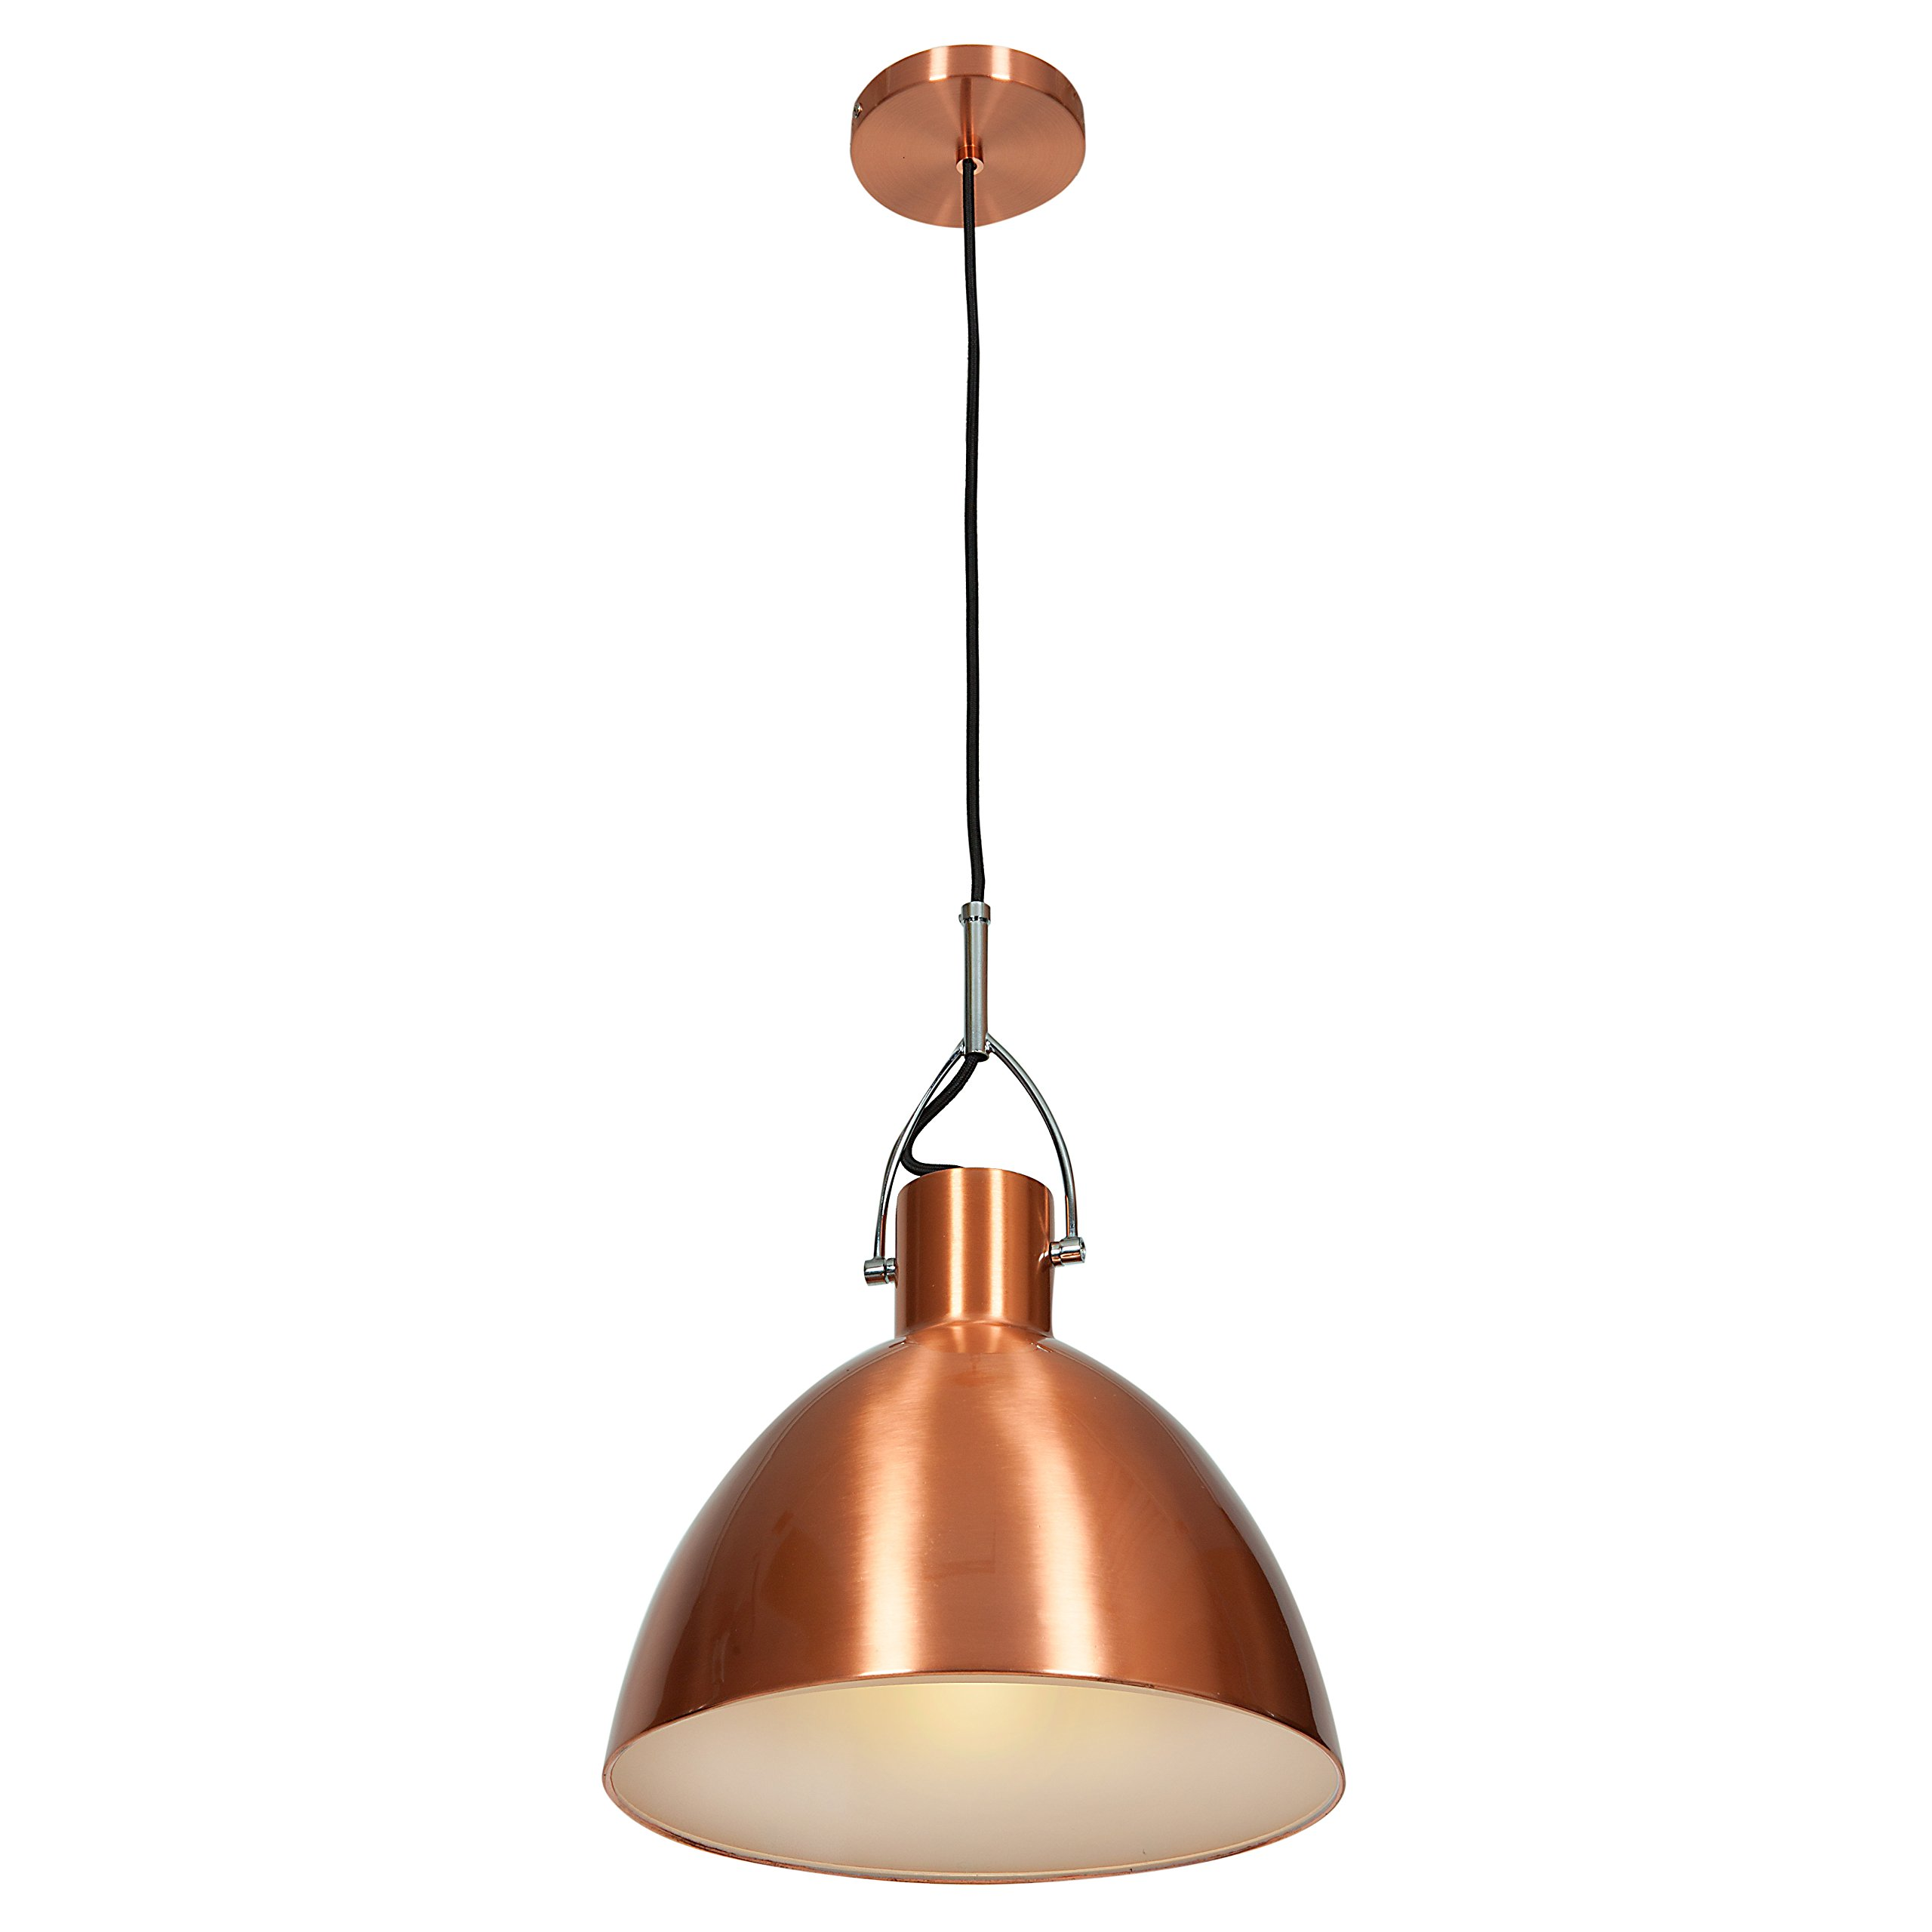 Essence - 1 Light - Pendant - Brushed Copper Finish